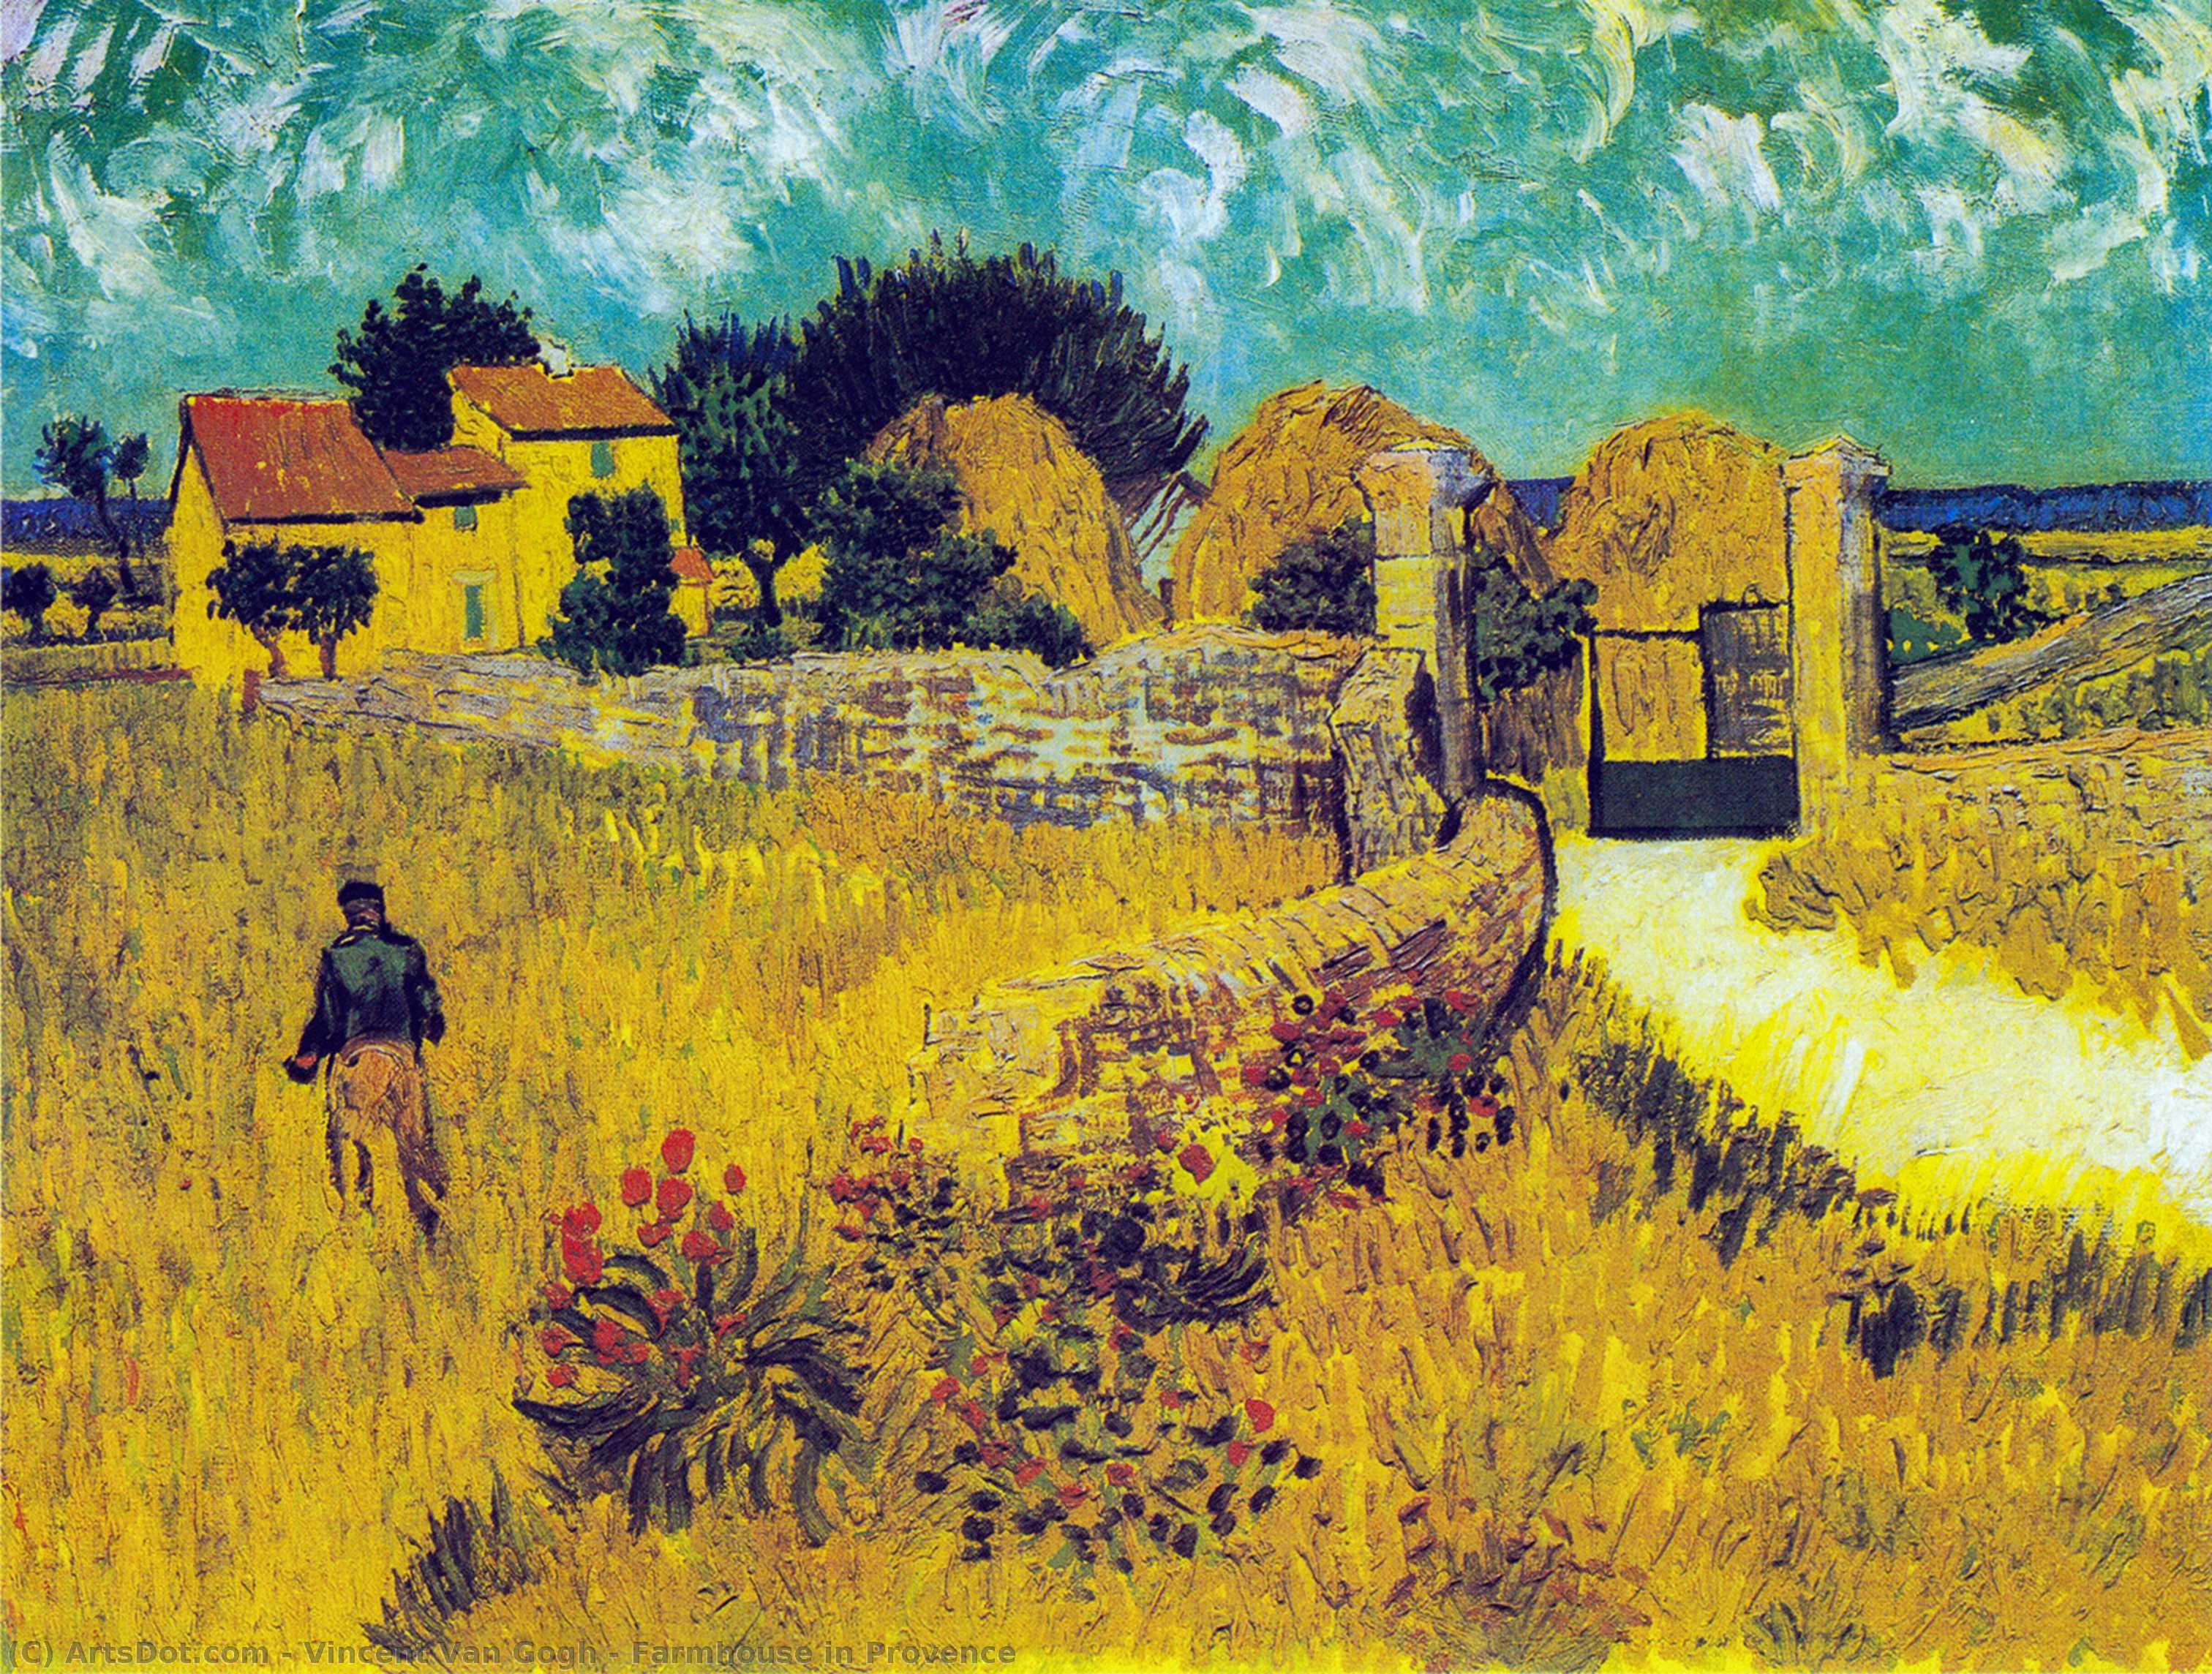 Farmhouse in Provence - Vincent Van Gogh